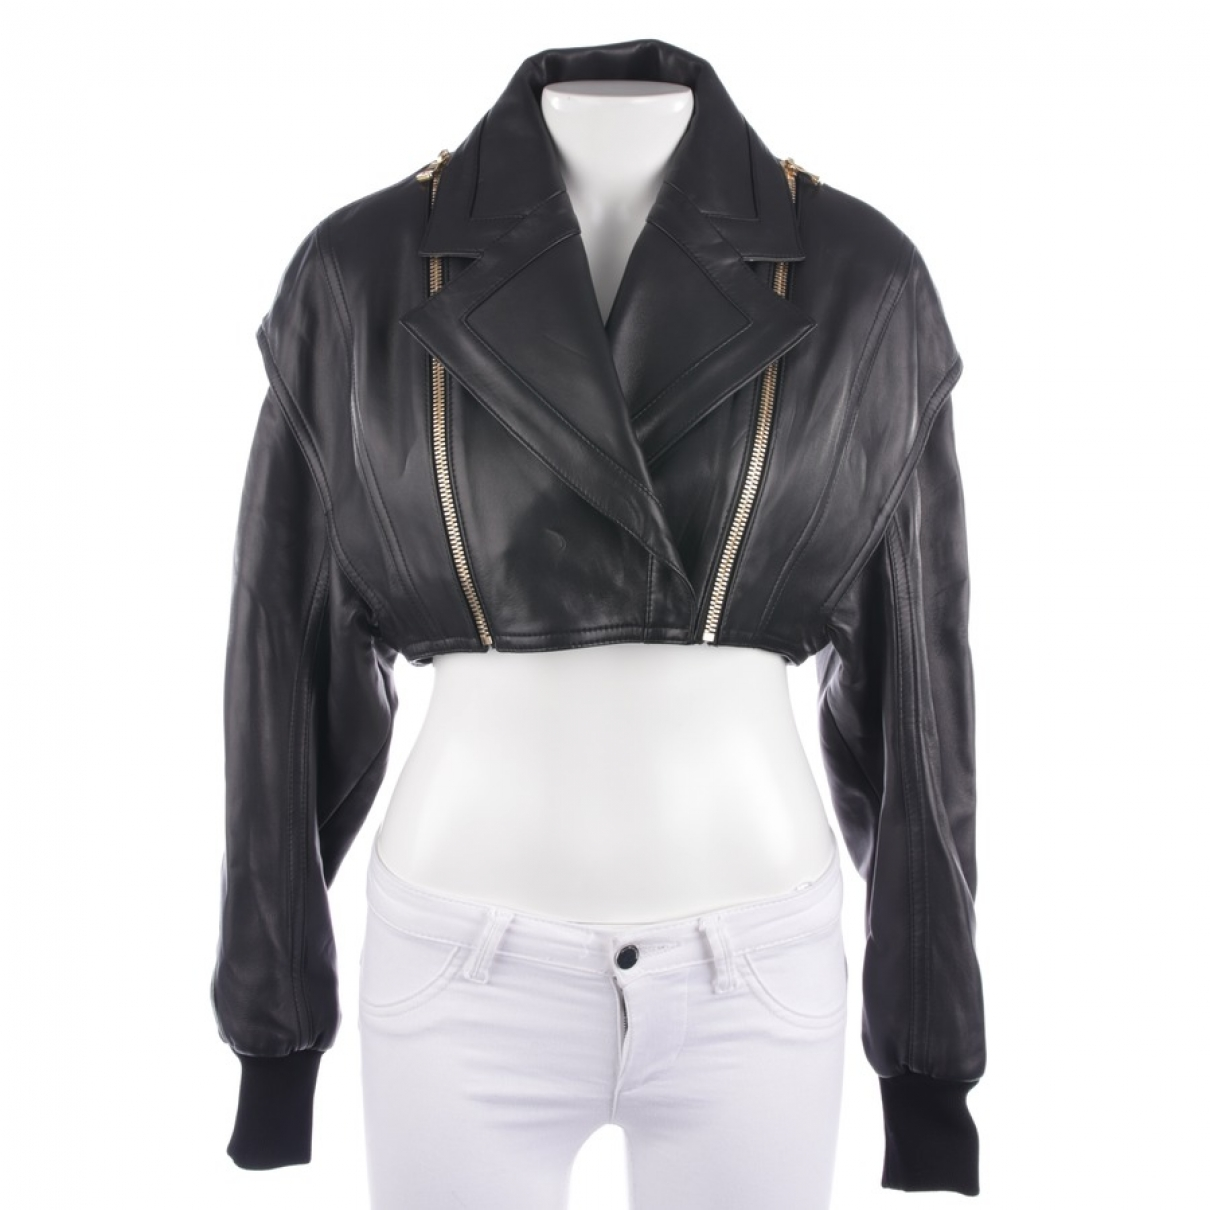 Balmain \N Black Leather jacket for Women S International